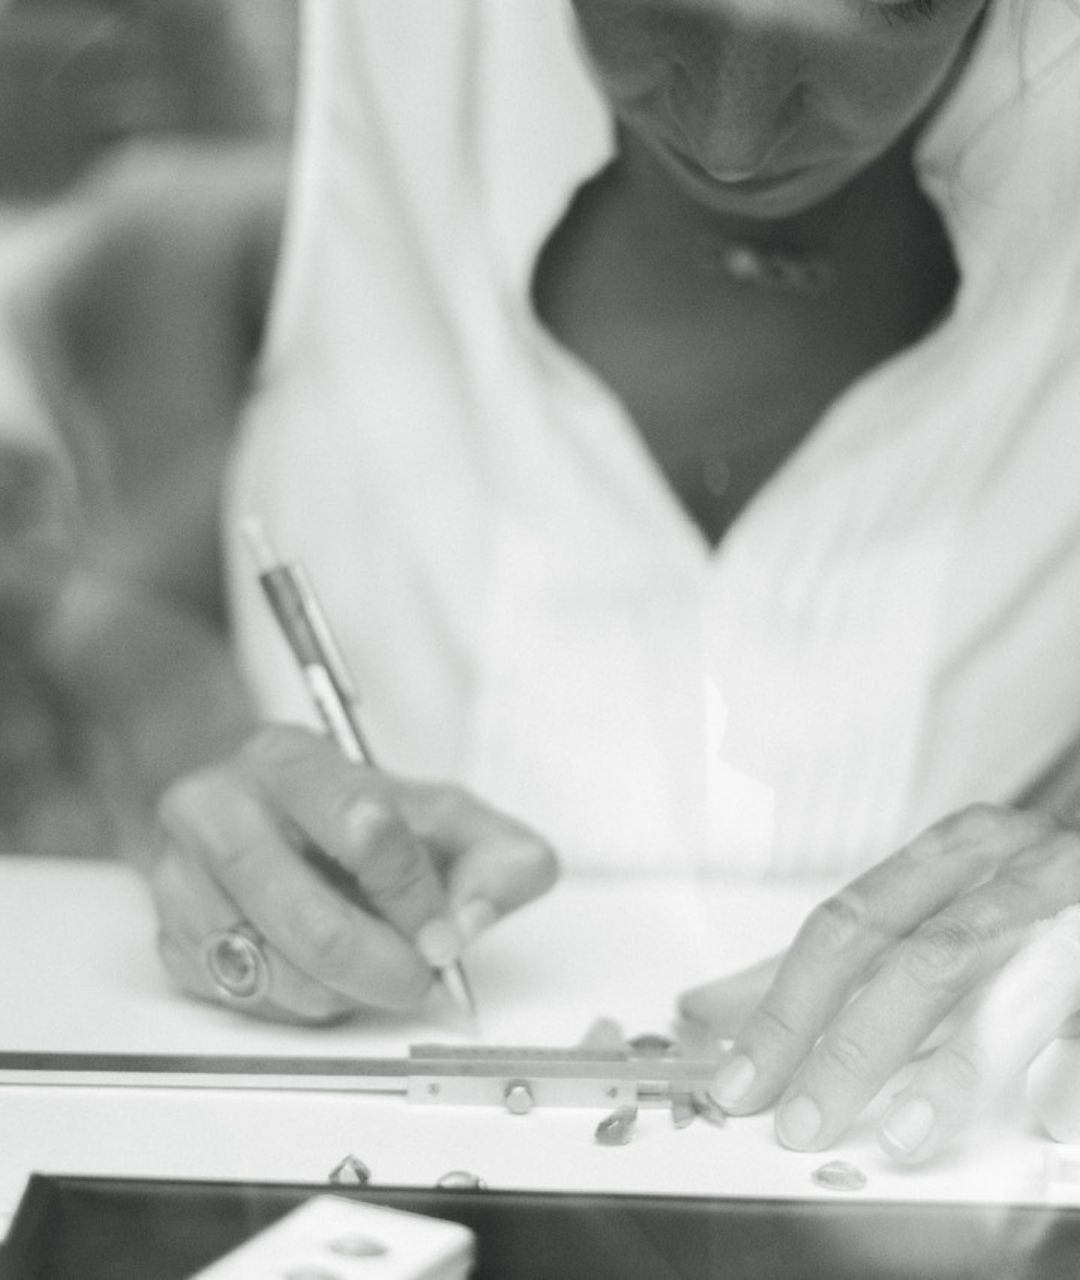 Audrey Huet Joaillerie Jewellery Designer Créatrice de bijoux Gemmologue audace élégance